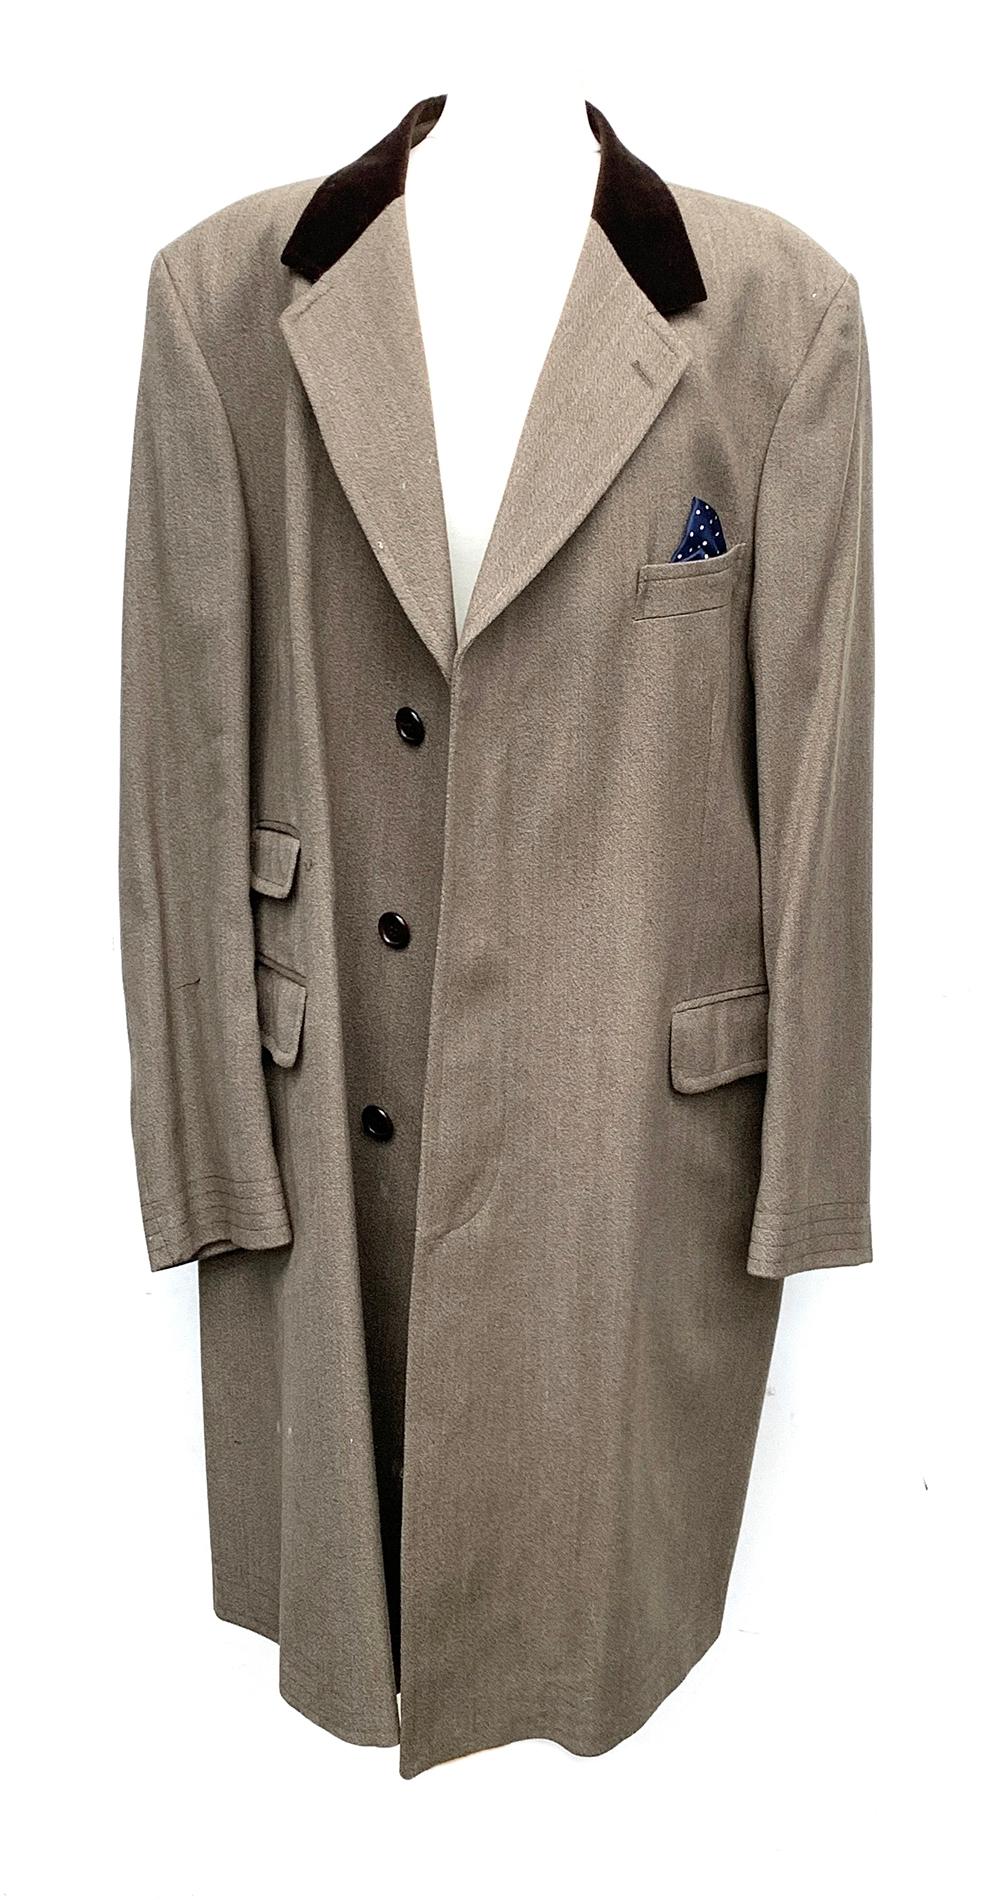 "A Grenfell wool covert coat with brown velvet collar, 46"" chest"